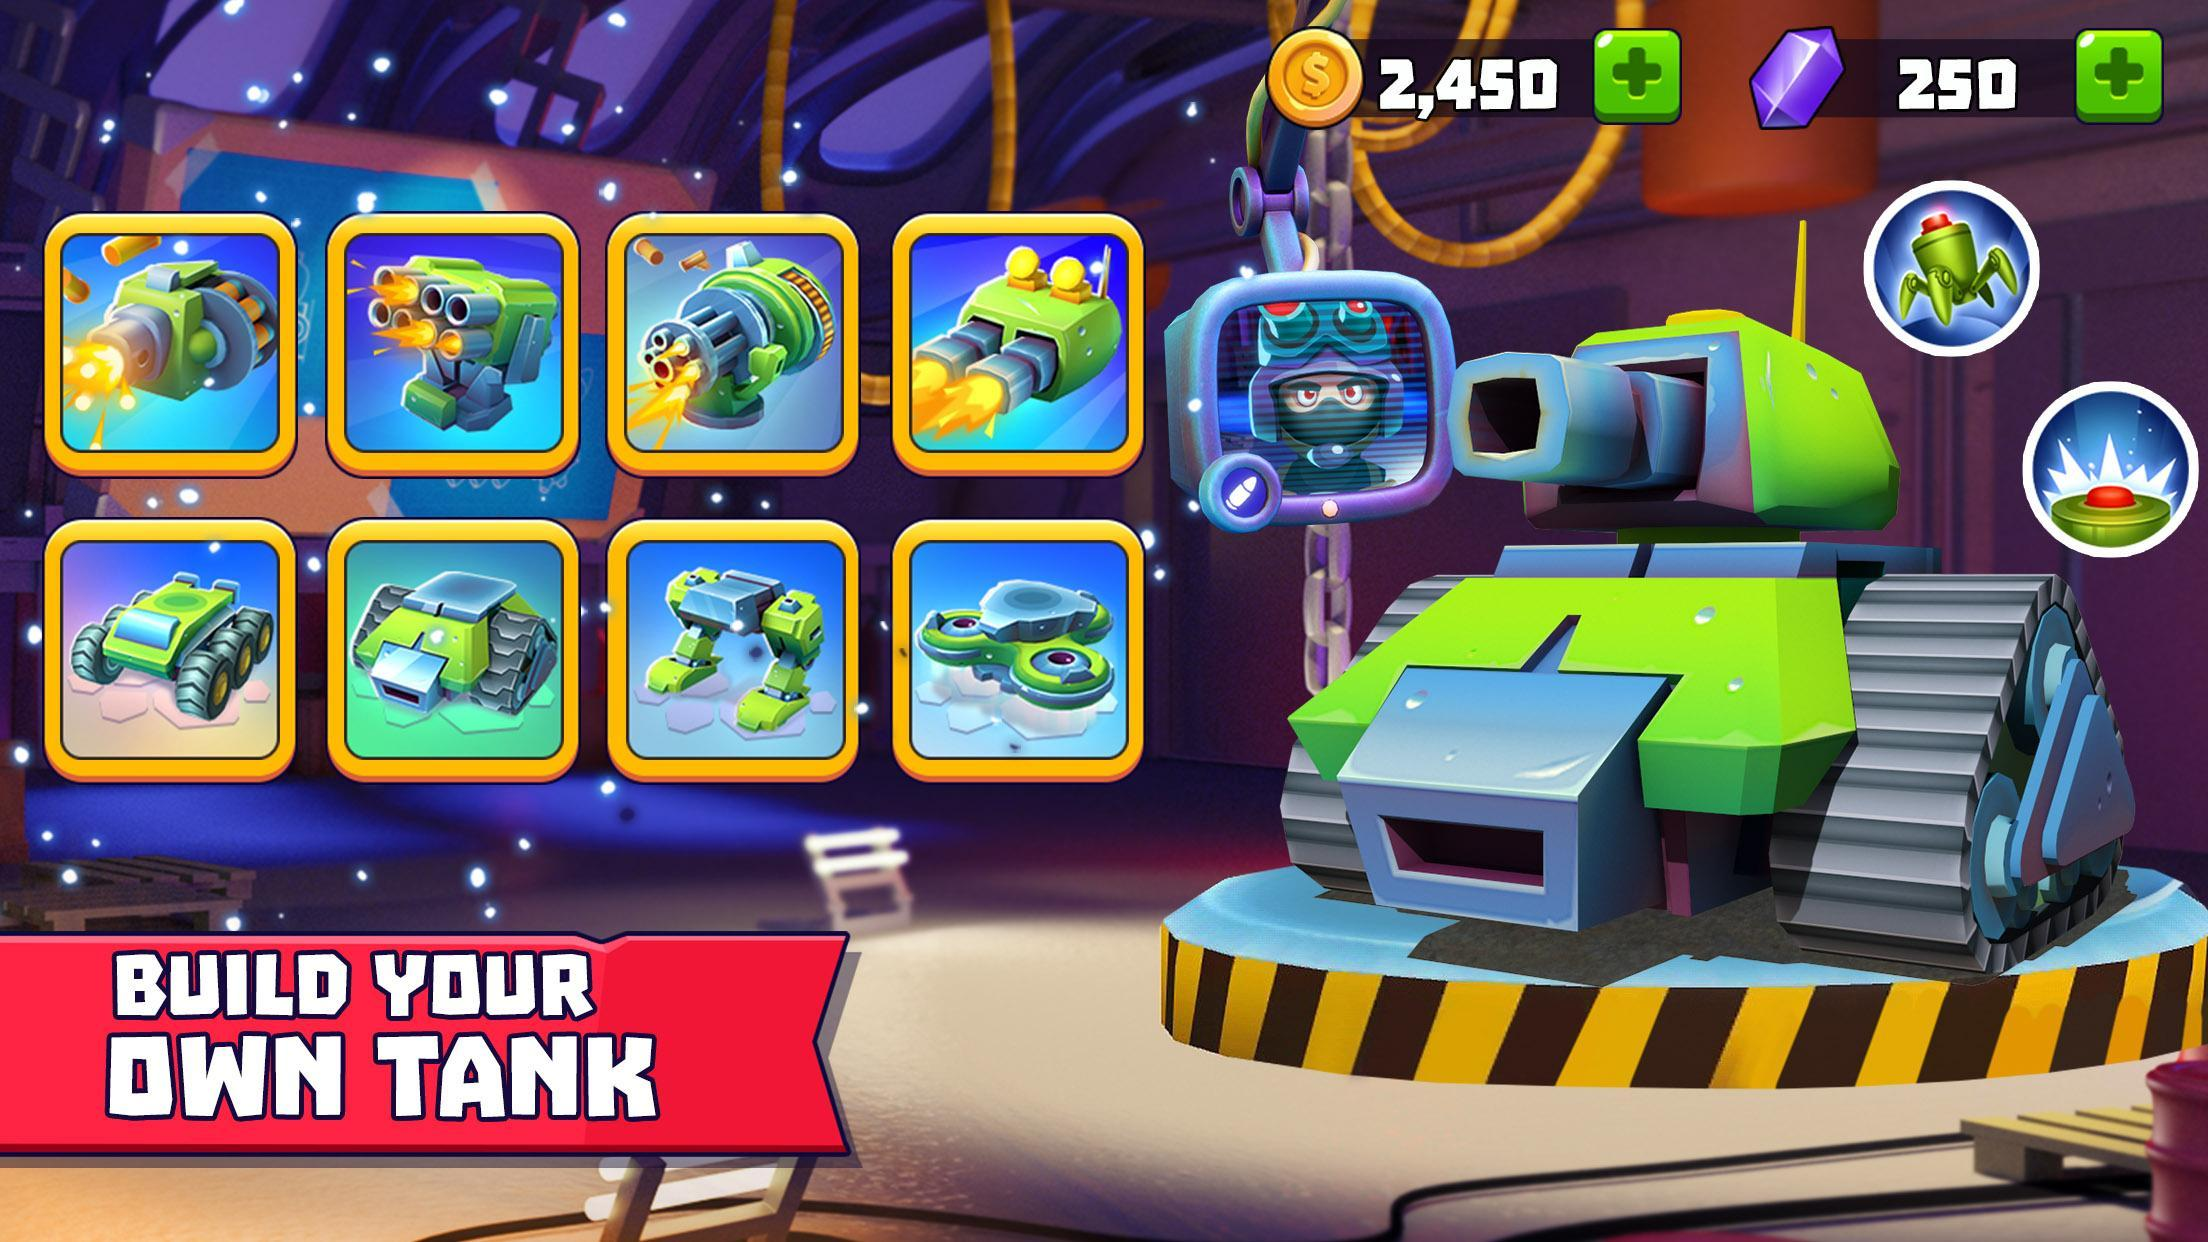 Tanks A Lot! - Realtime Multiplayer Battle Arena 2.56 Screenshot 2